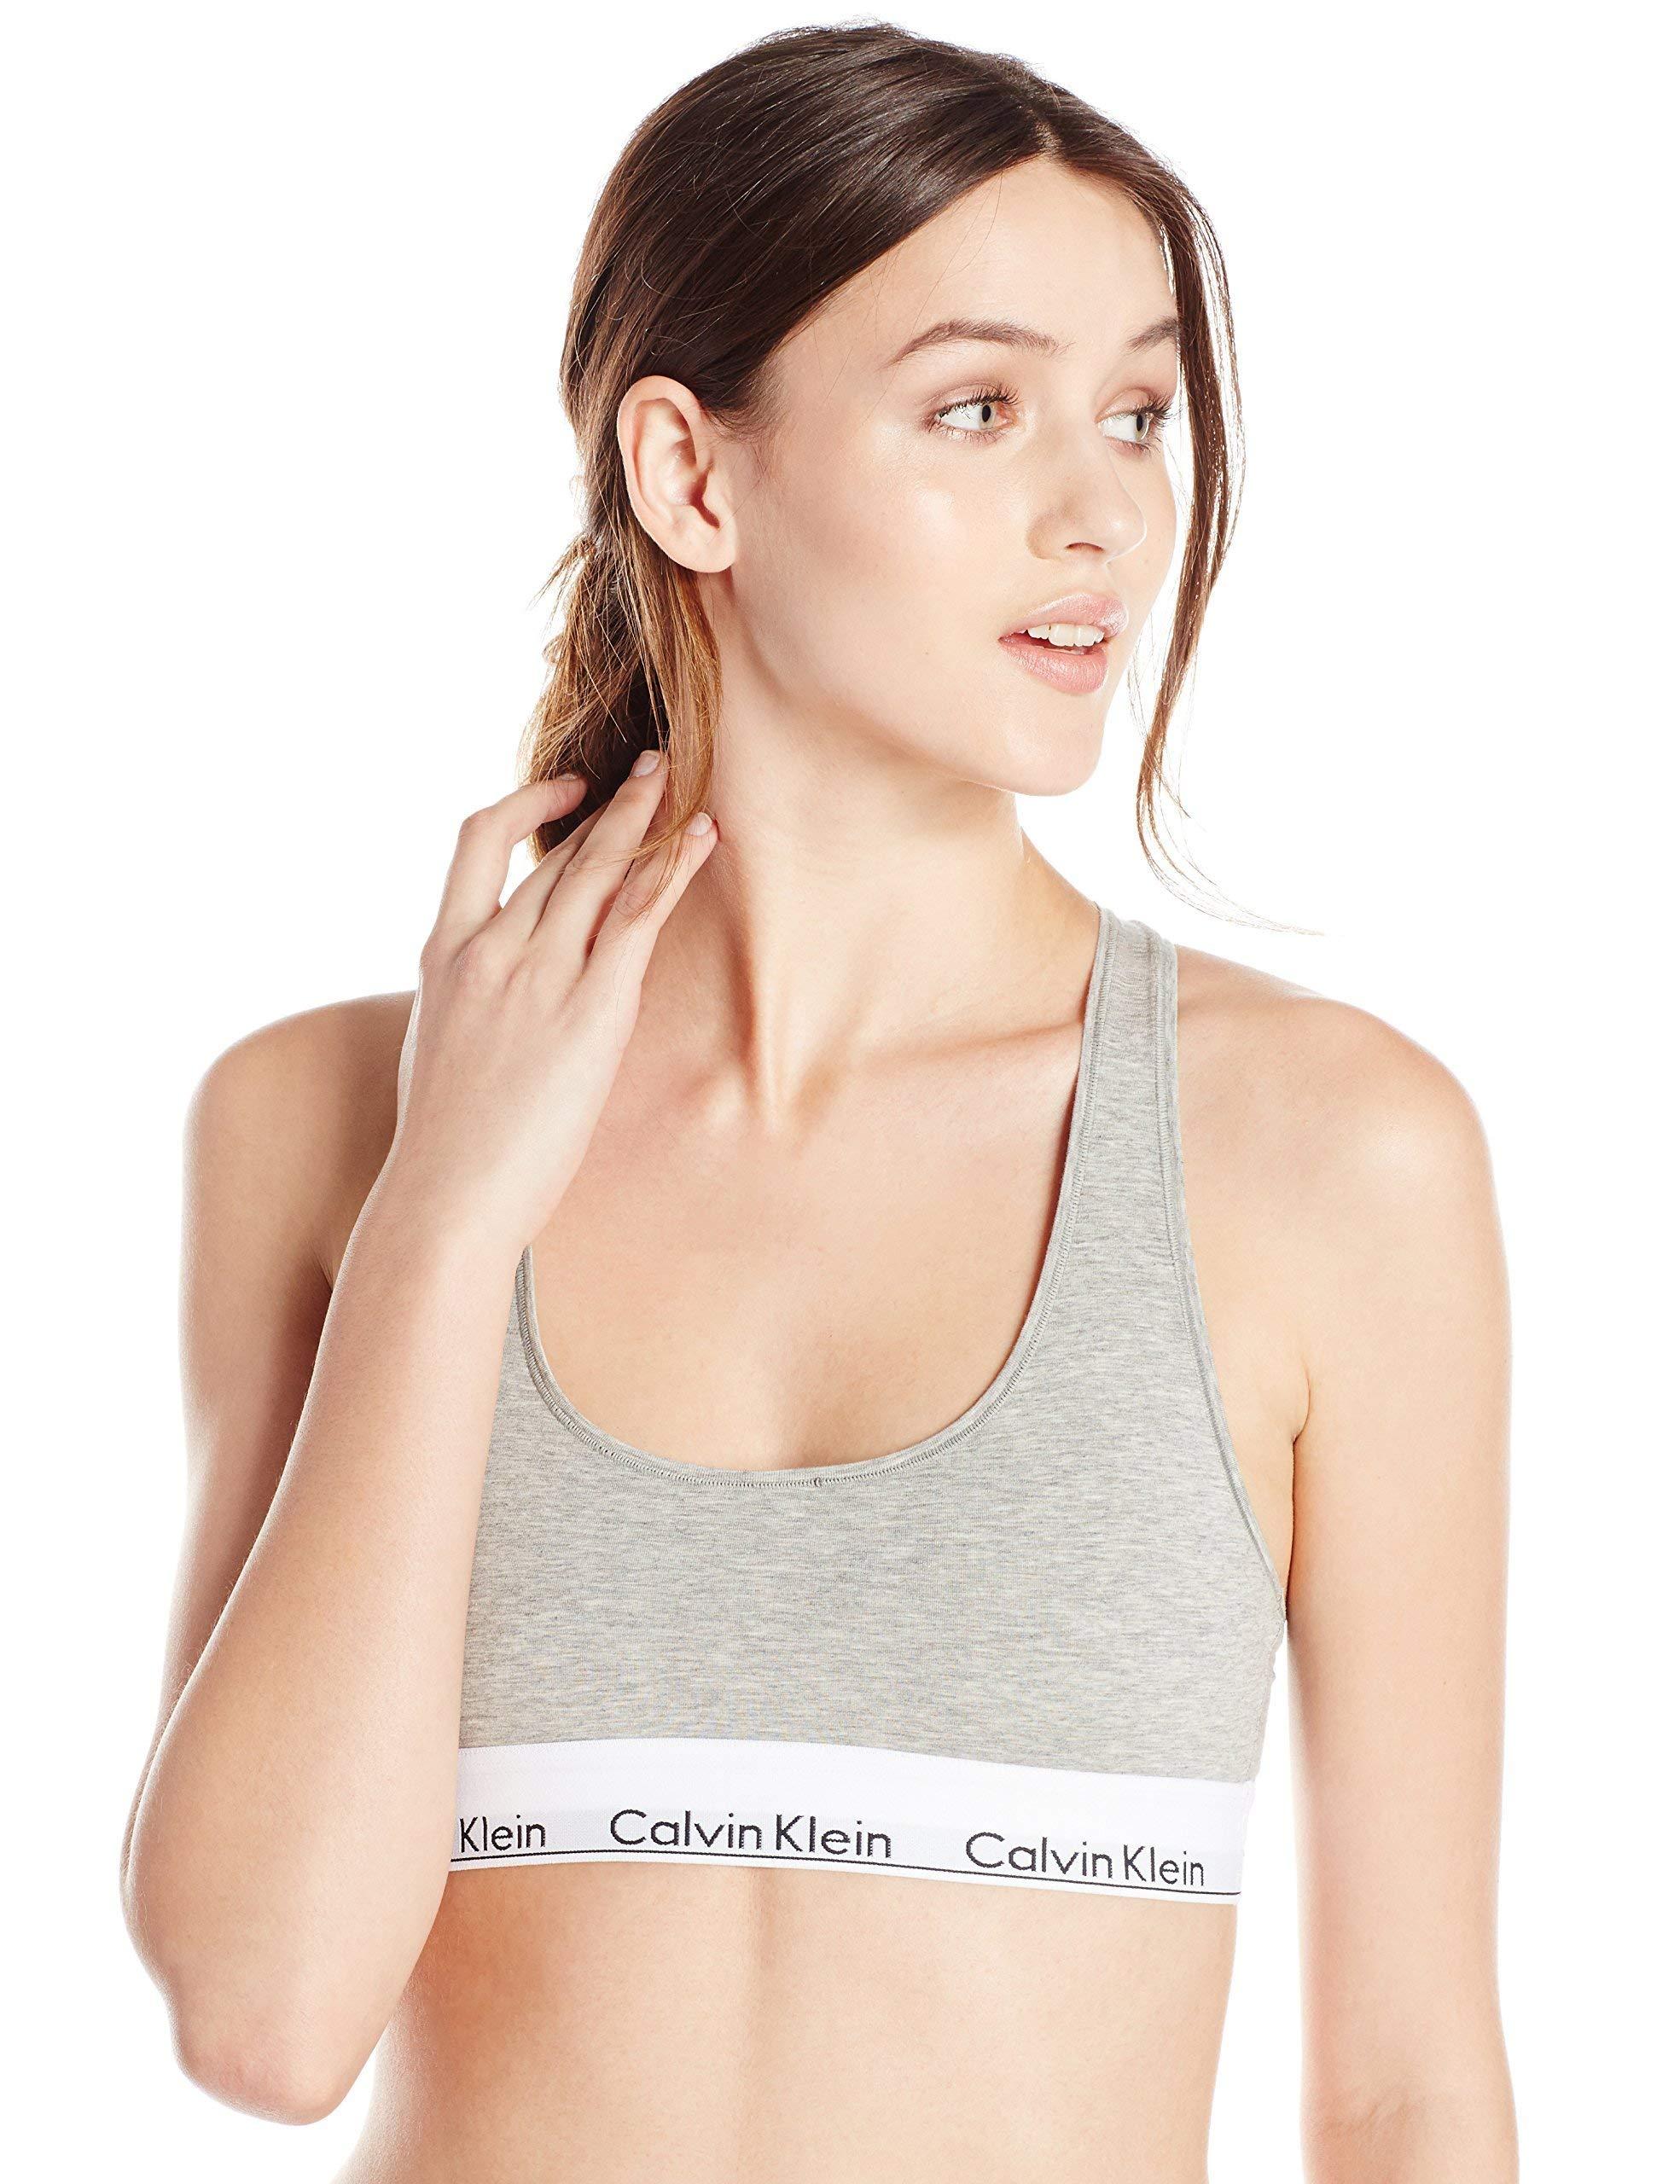 38f4d33957ed7 Galleon - Calvin Klein Women s Plus Size Modern Cotton Bralette ...